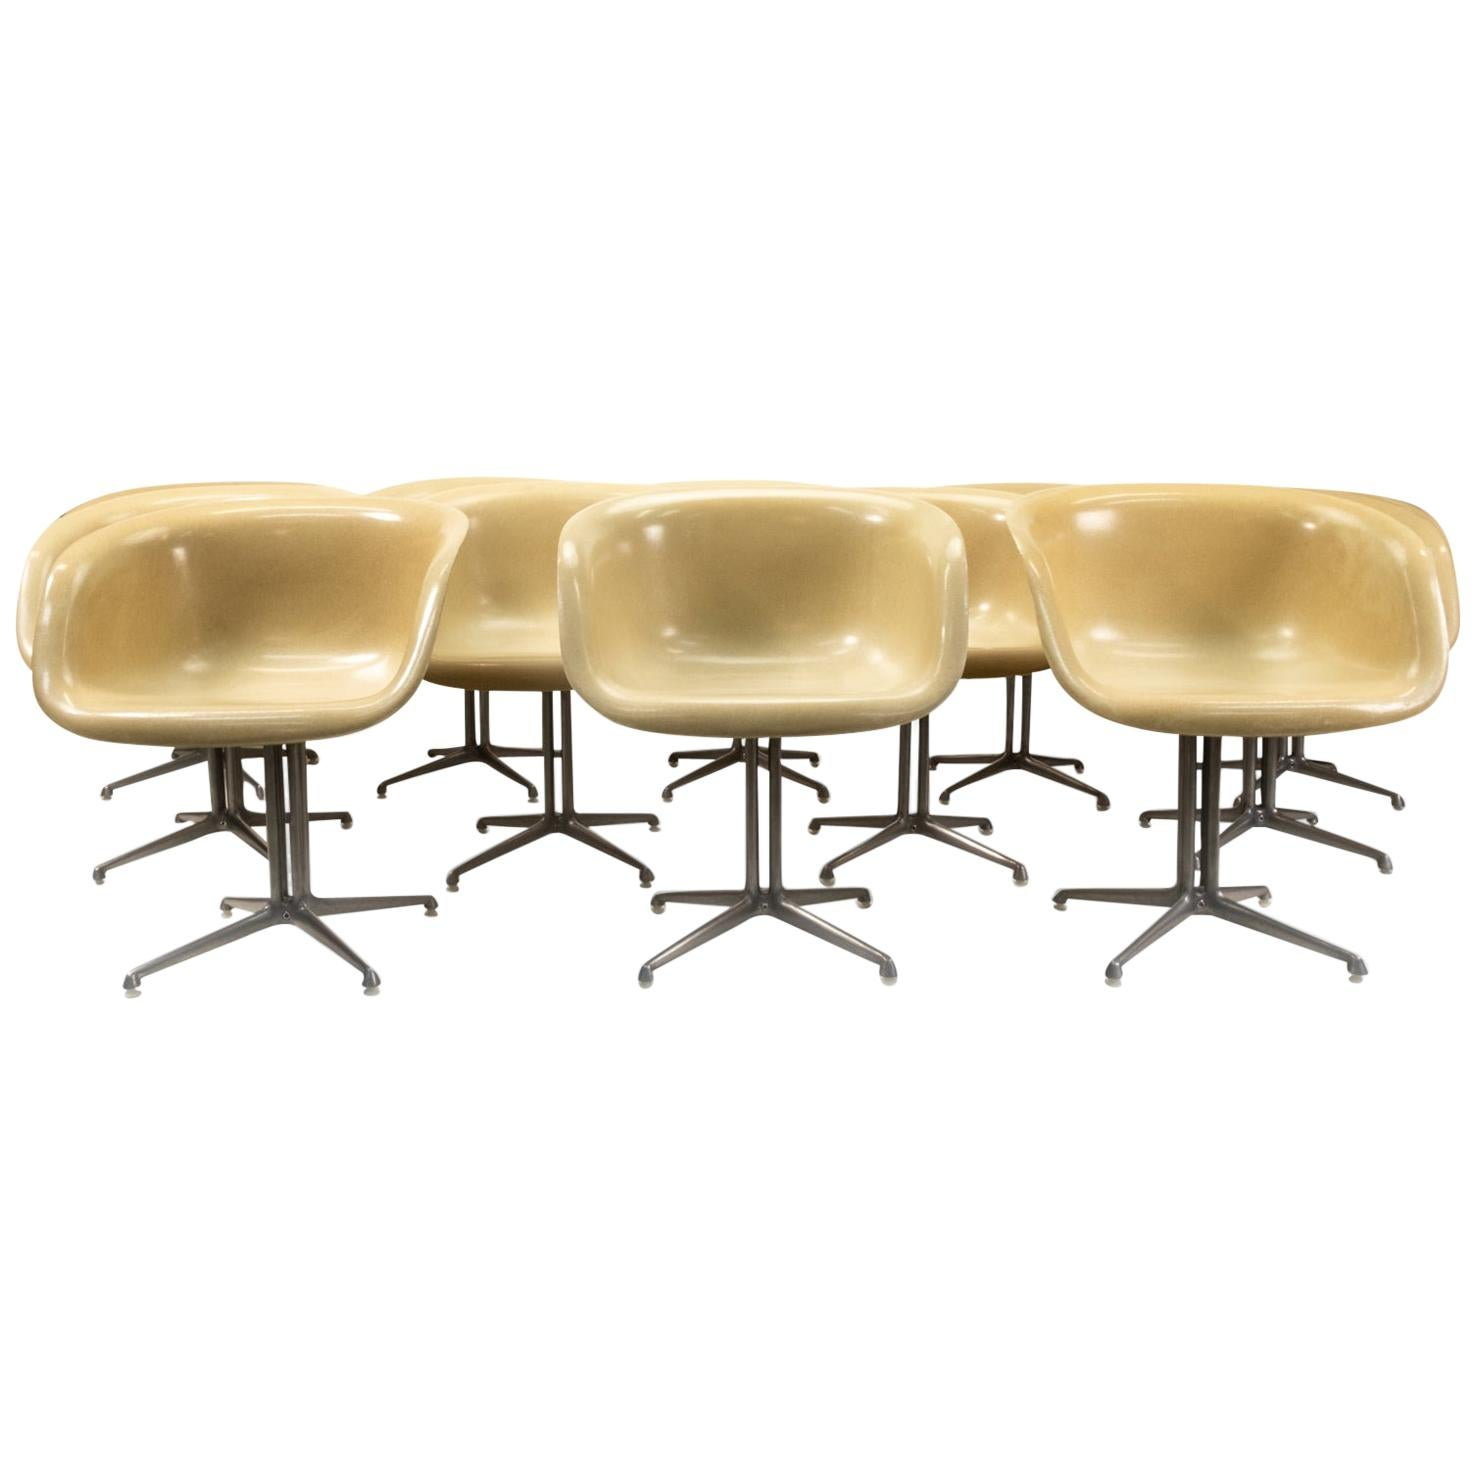 Eames Design Classic La Fonda Armchairs for Herman Miller Set of 12, 1960s